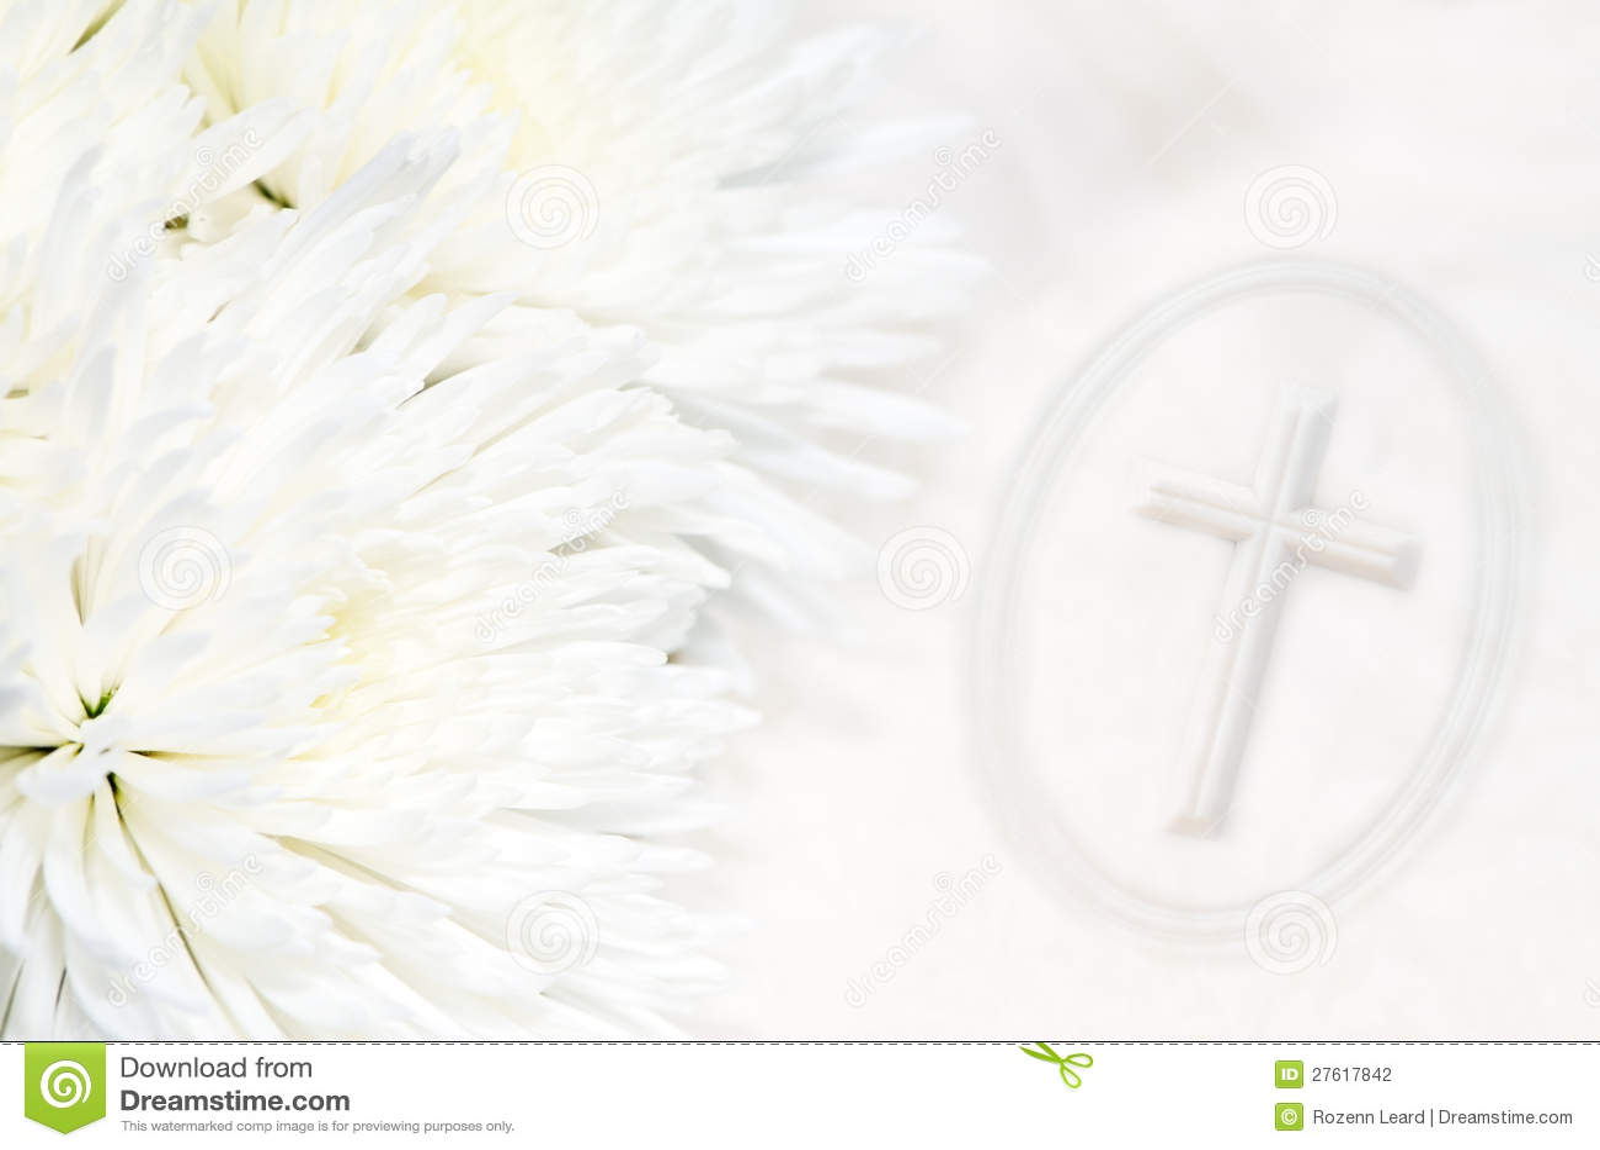 invitation for funeral ceremony – Funeral Ceremony Invitation